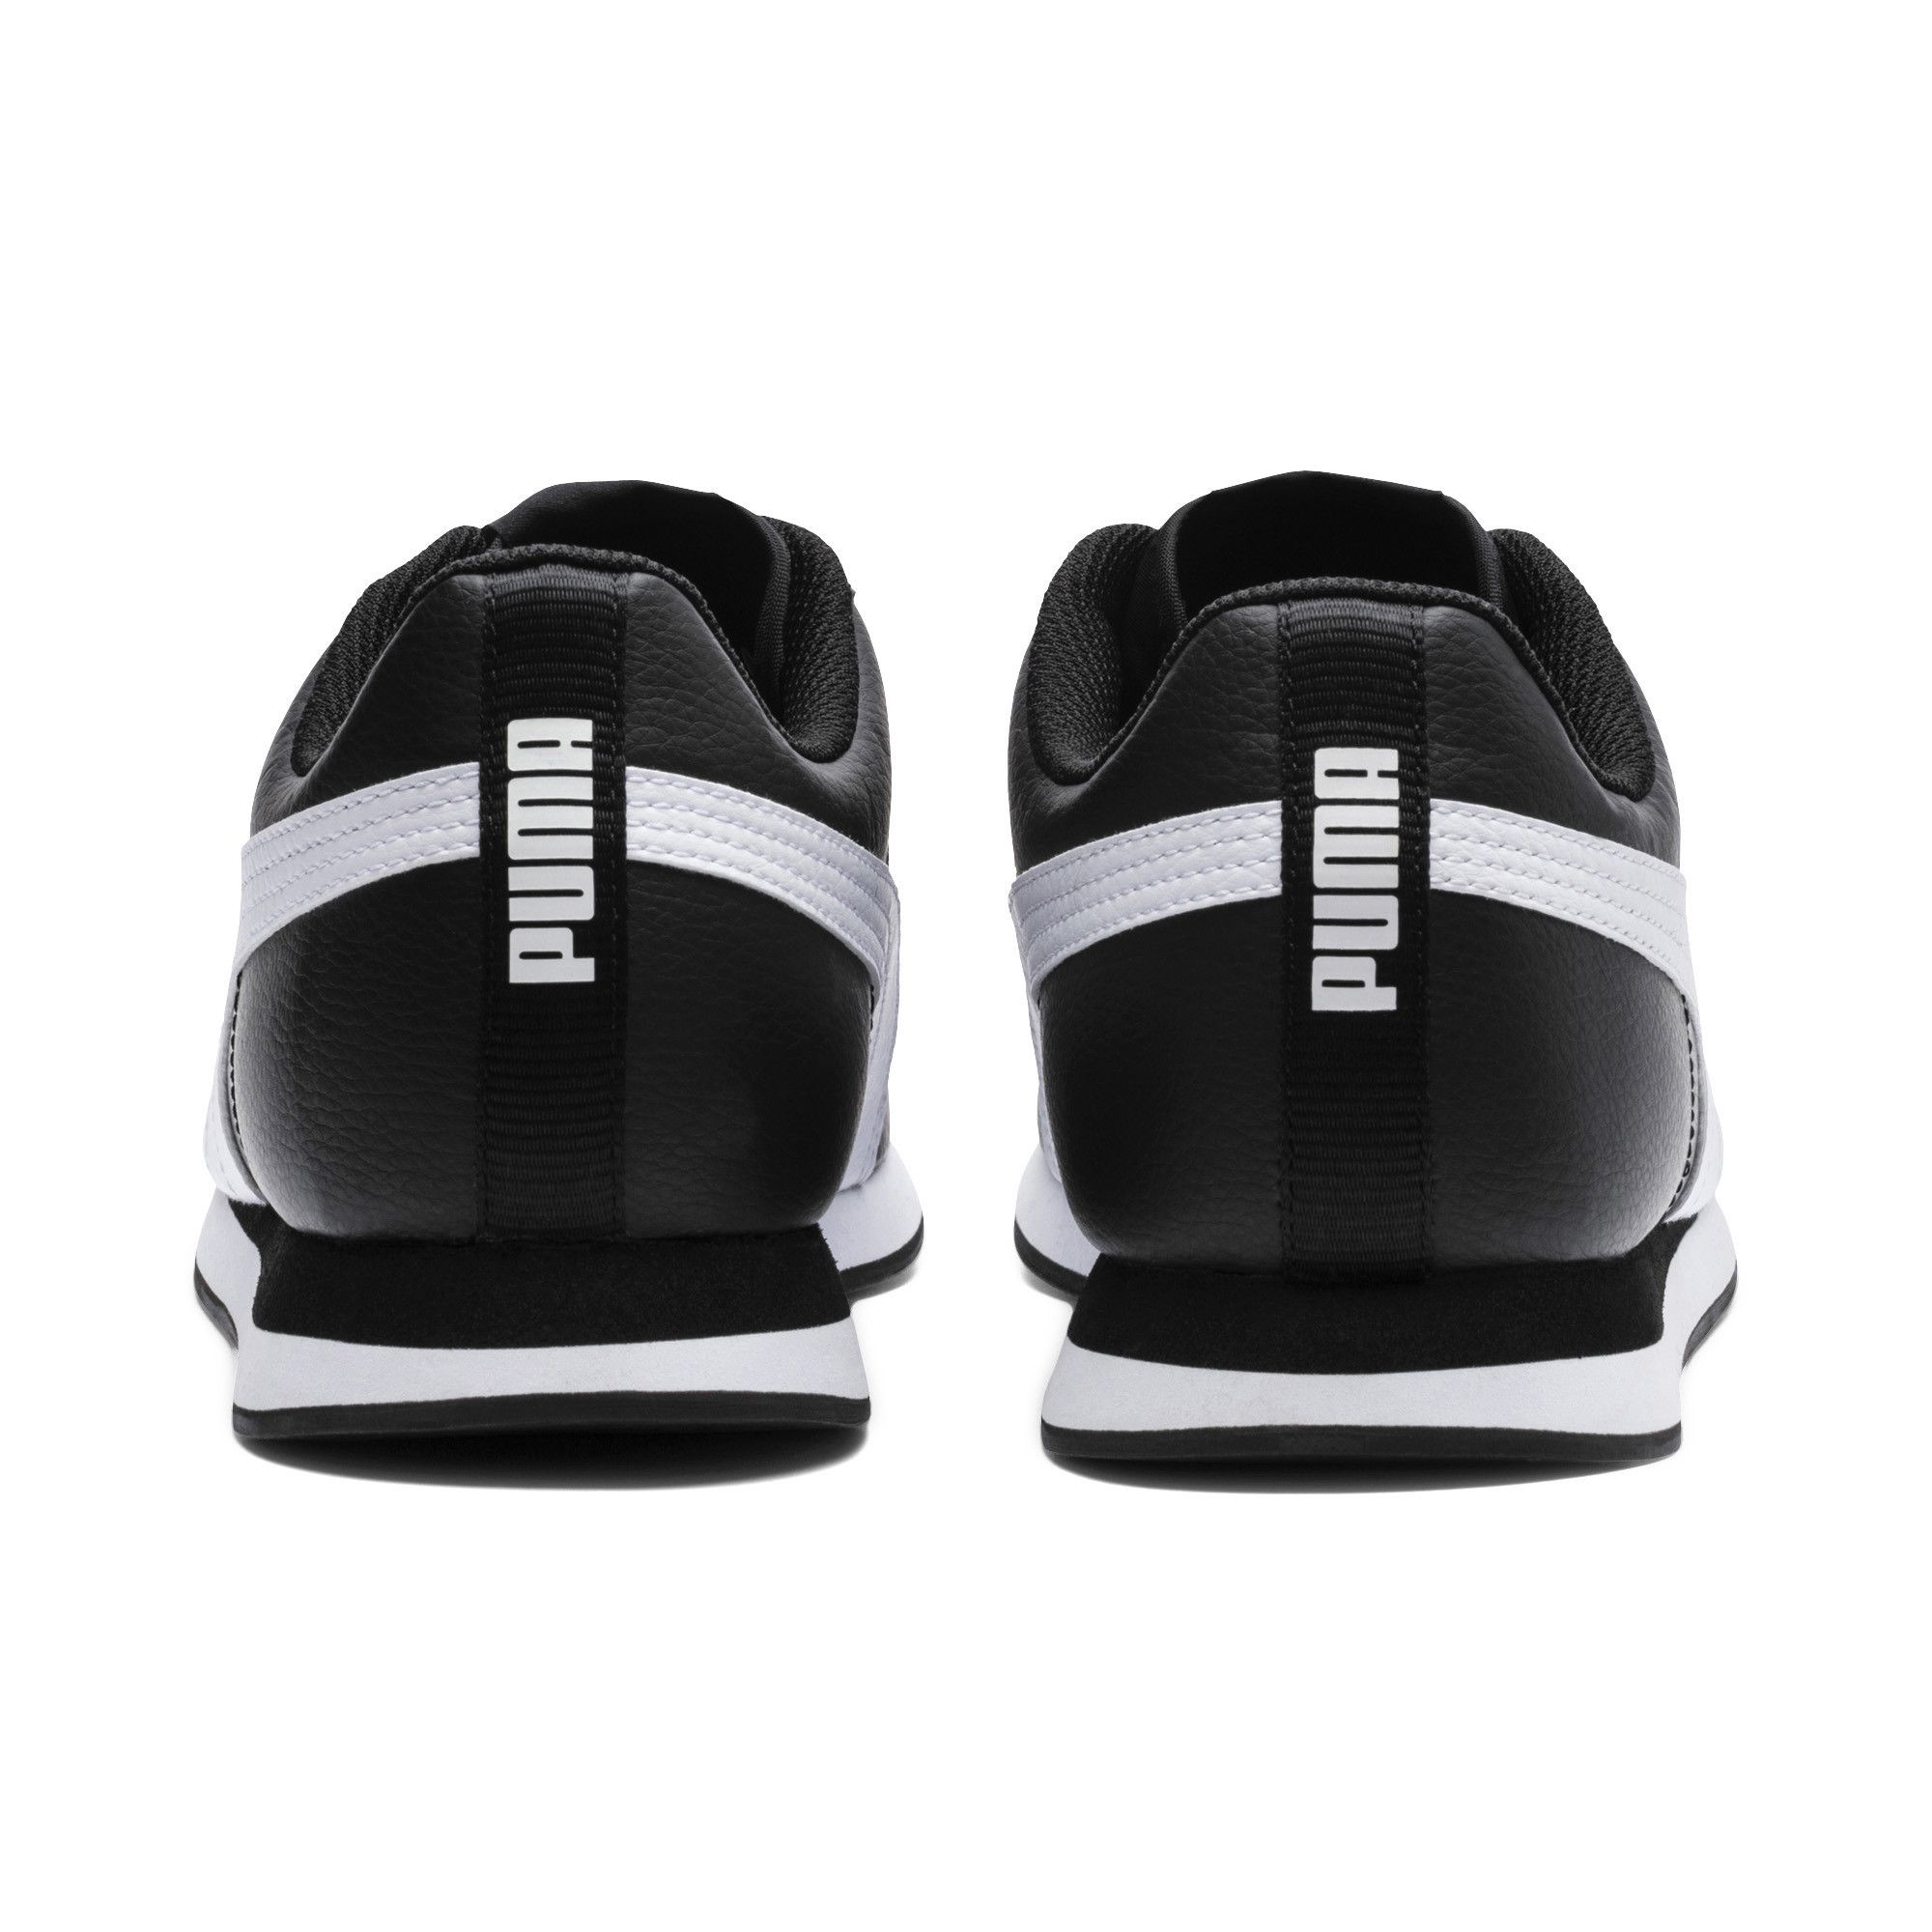 thumbnail 44 - PUMA Men's Turin II Sneakers